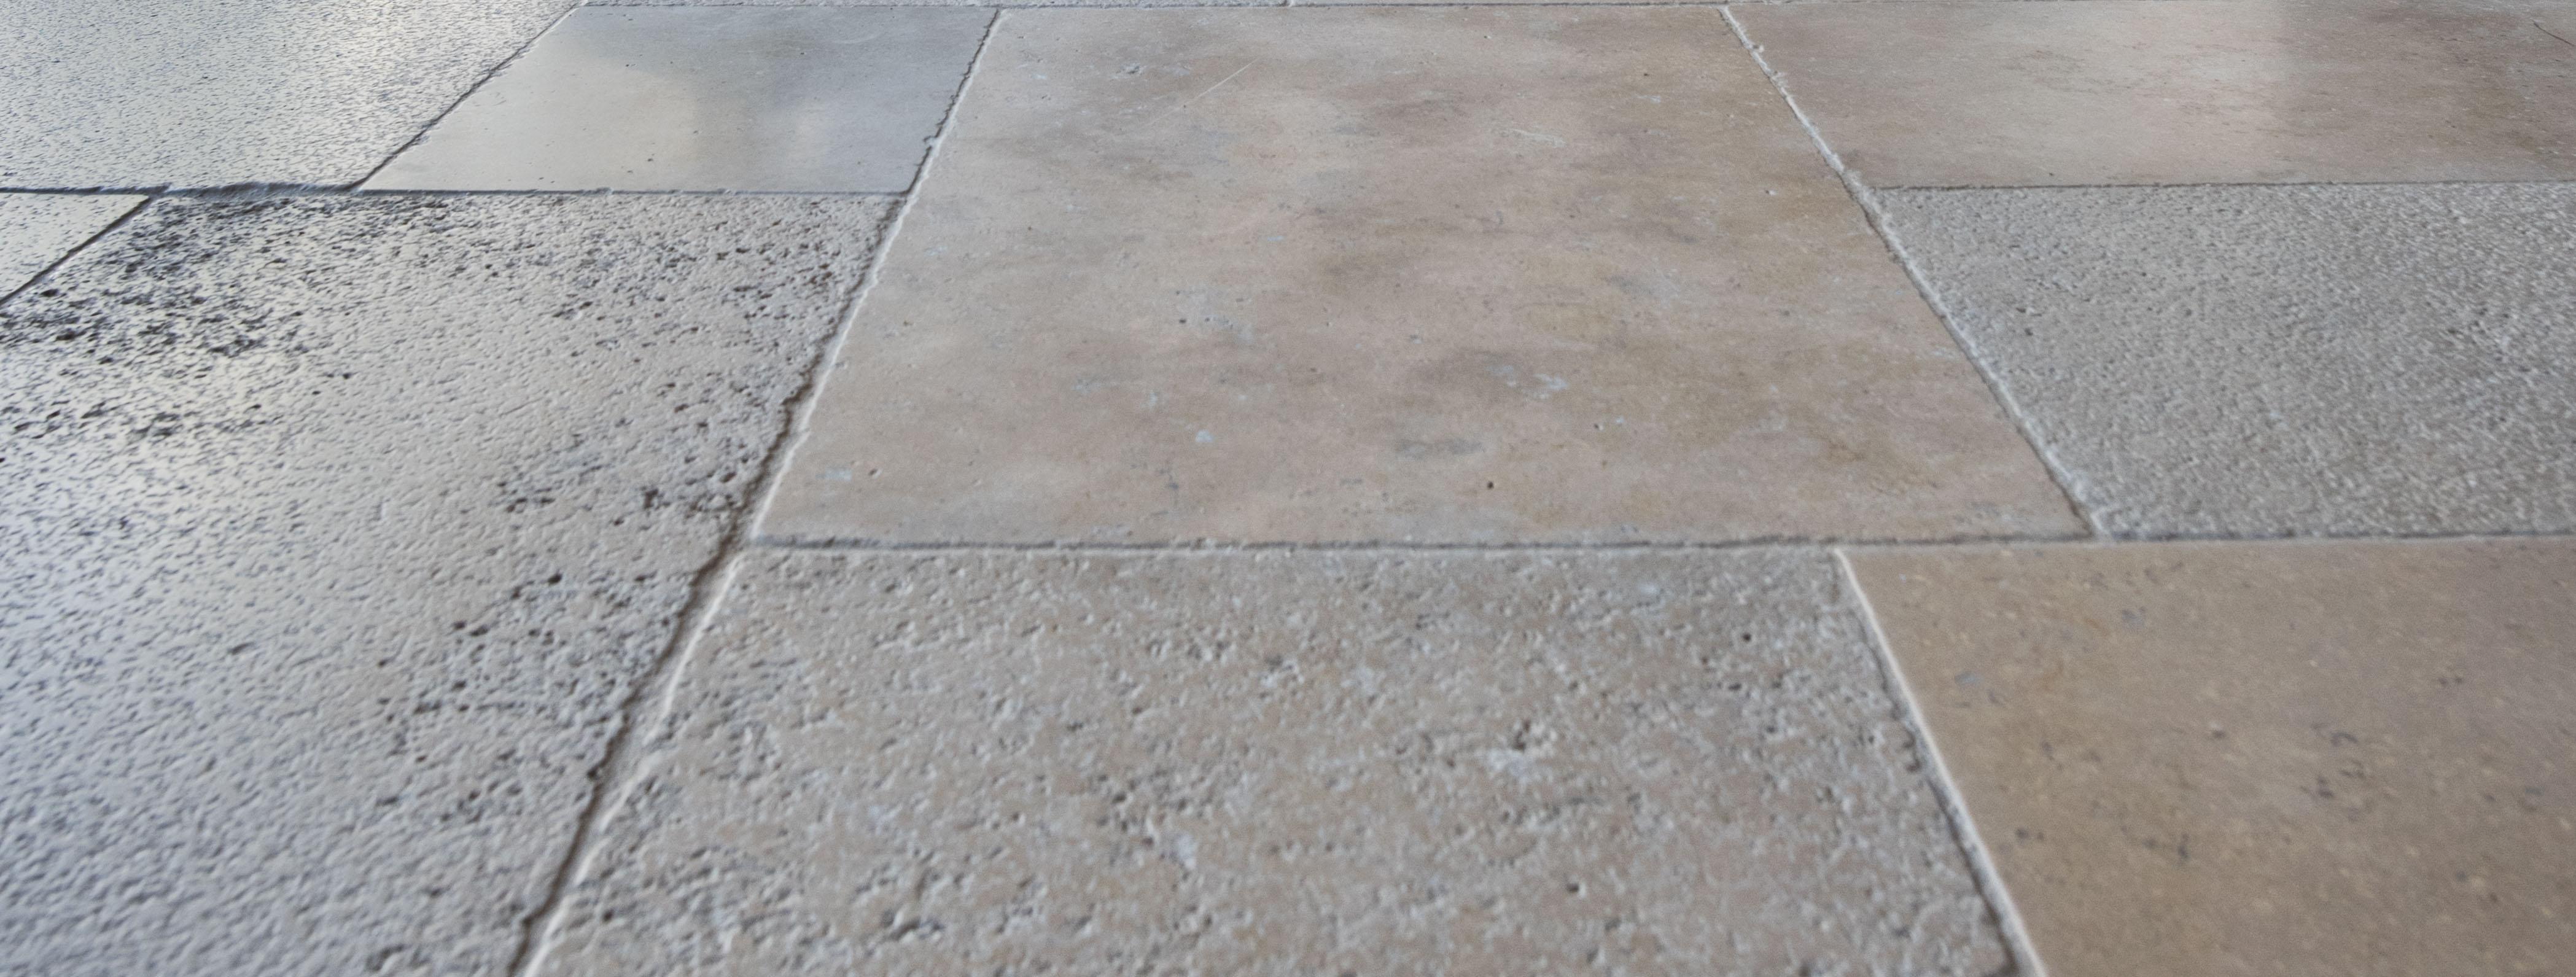 Natural beige stones